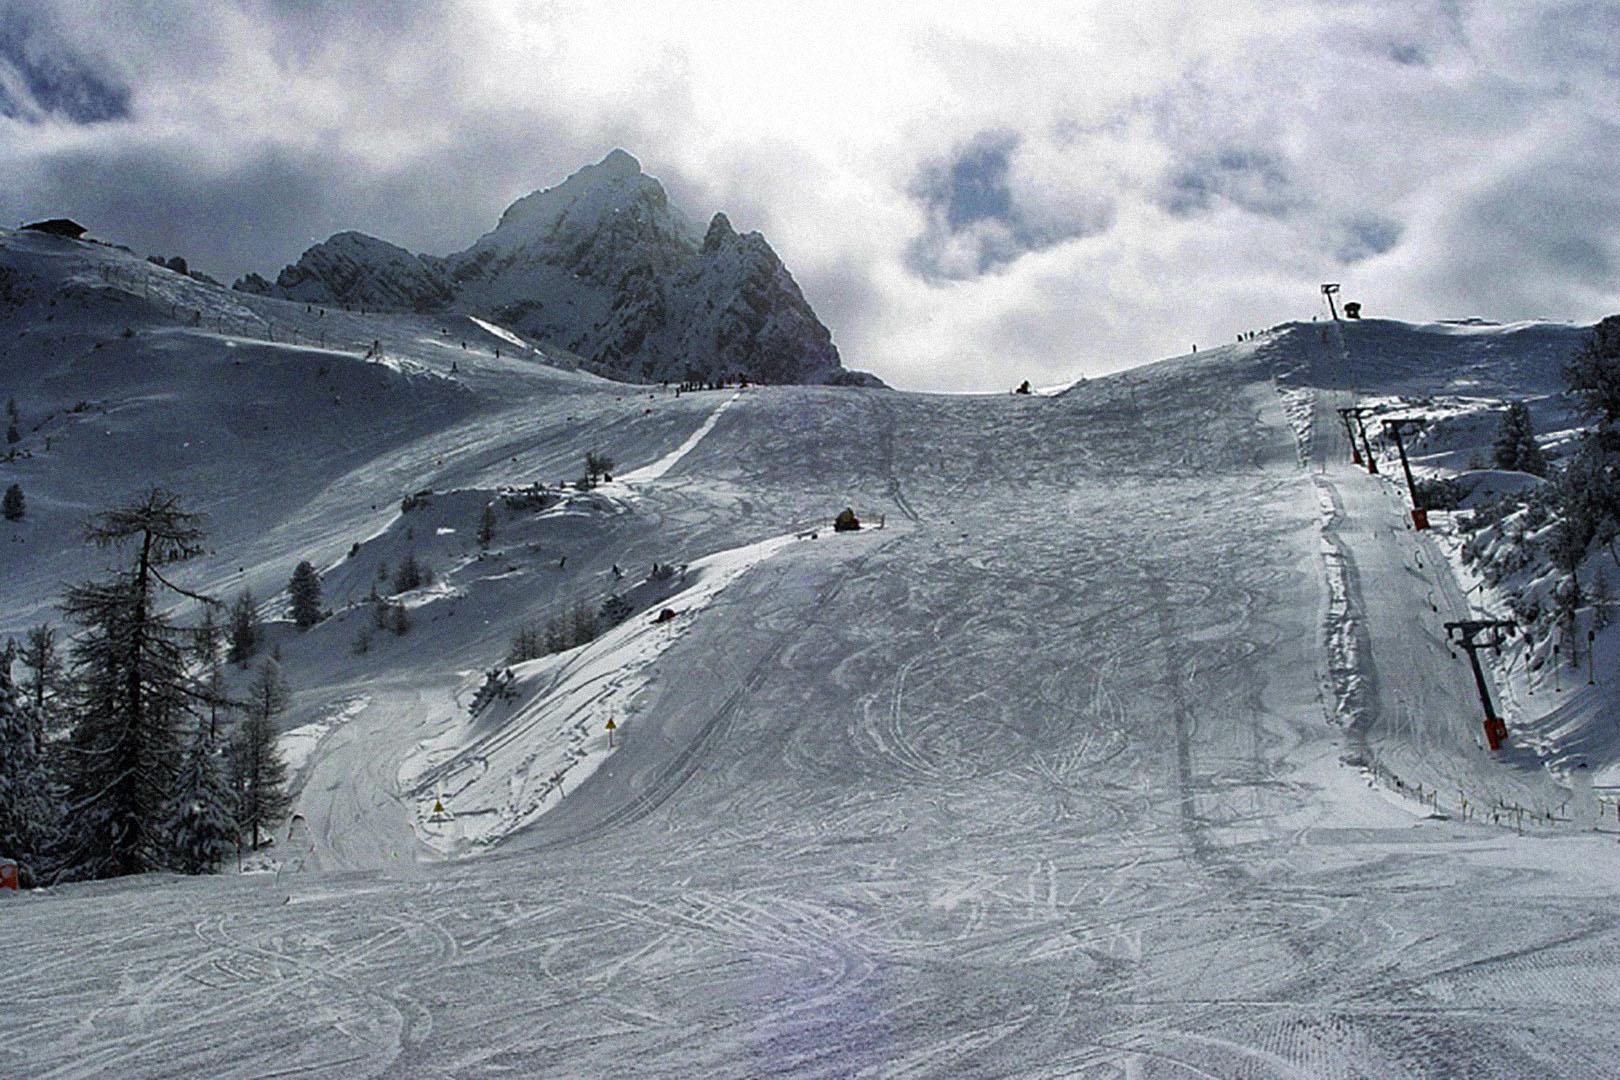 Estación italiana de Cortina d'Ampezzo